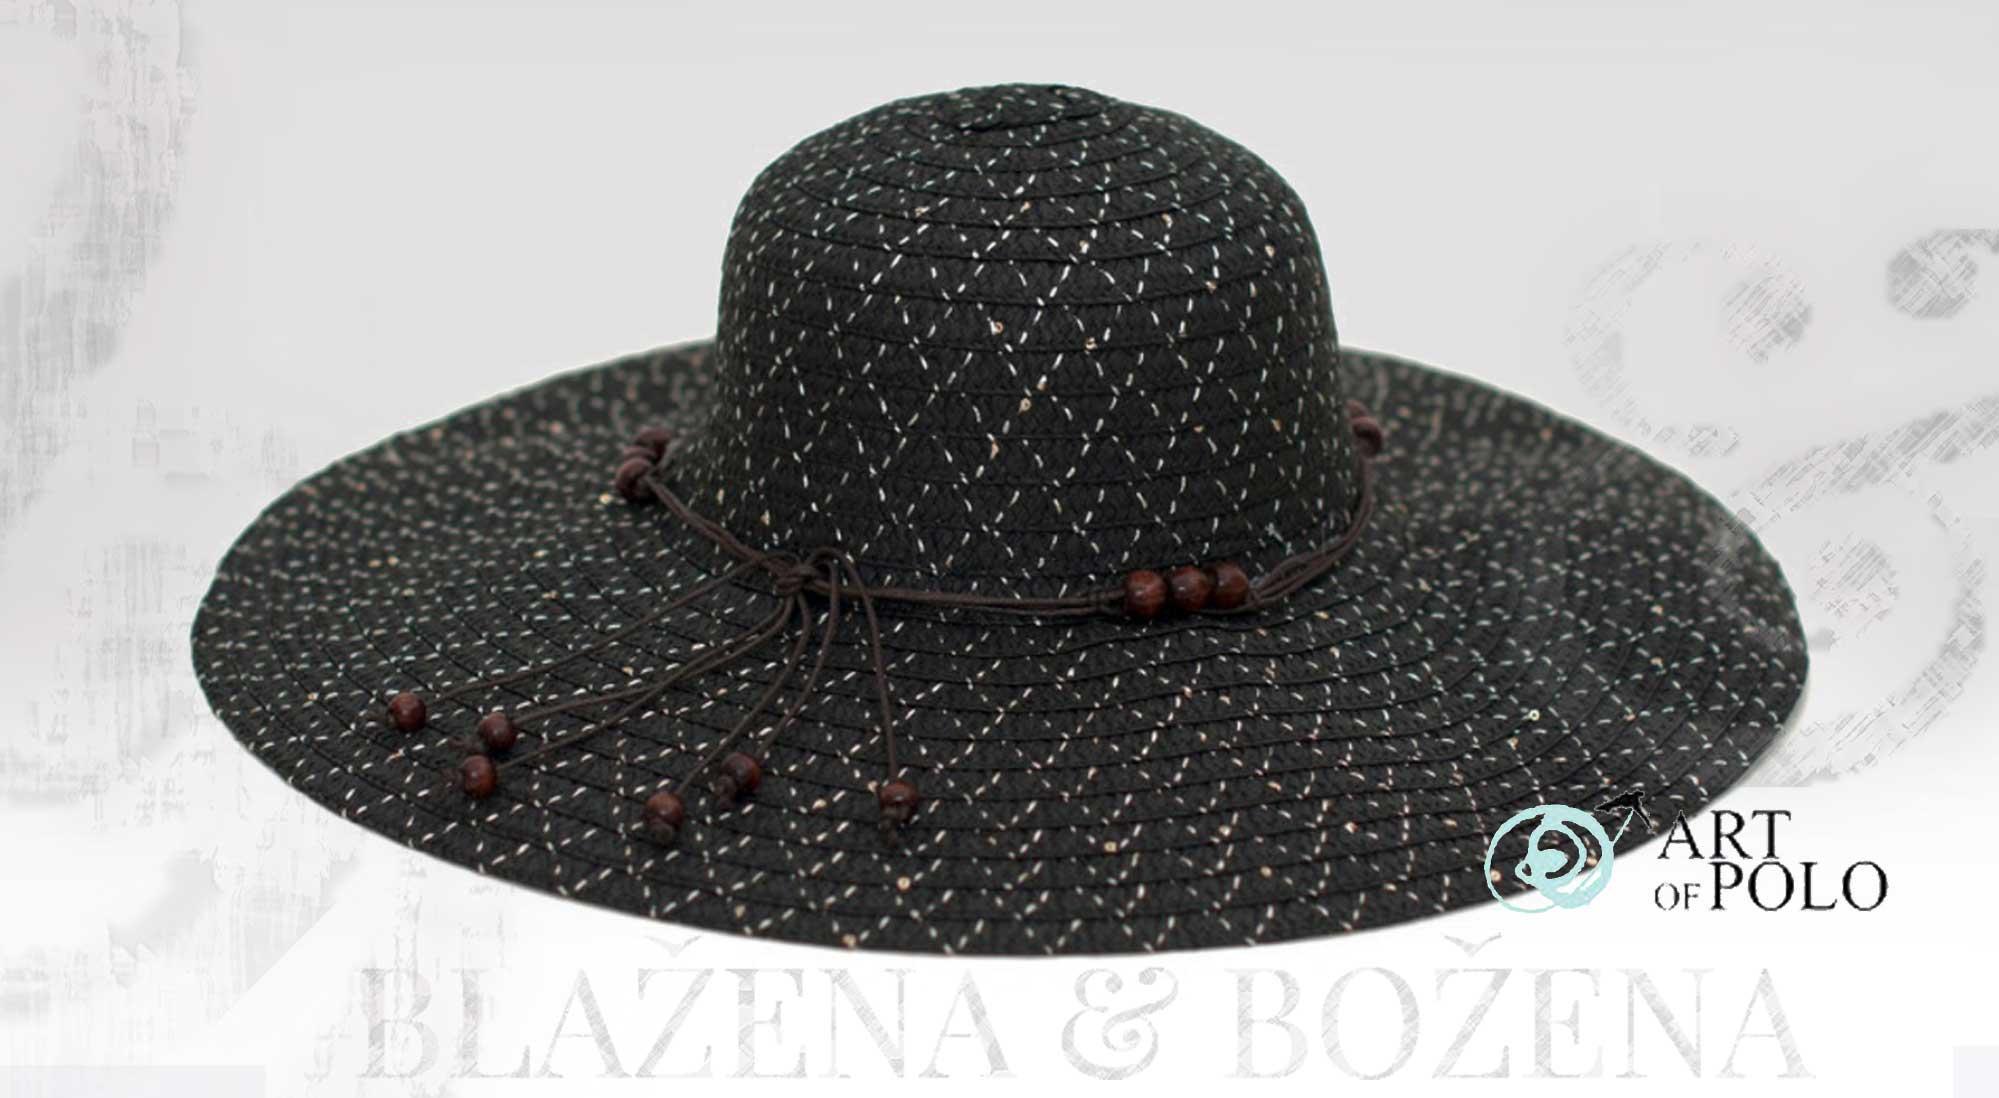 Letní klobouk s korálky černý – Blažena Božena 42baeb3e6b